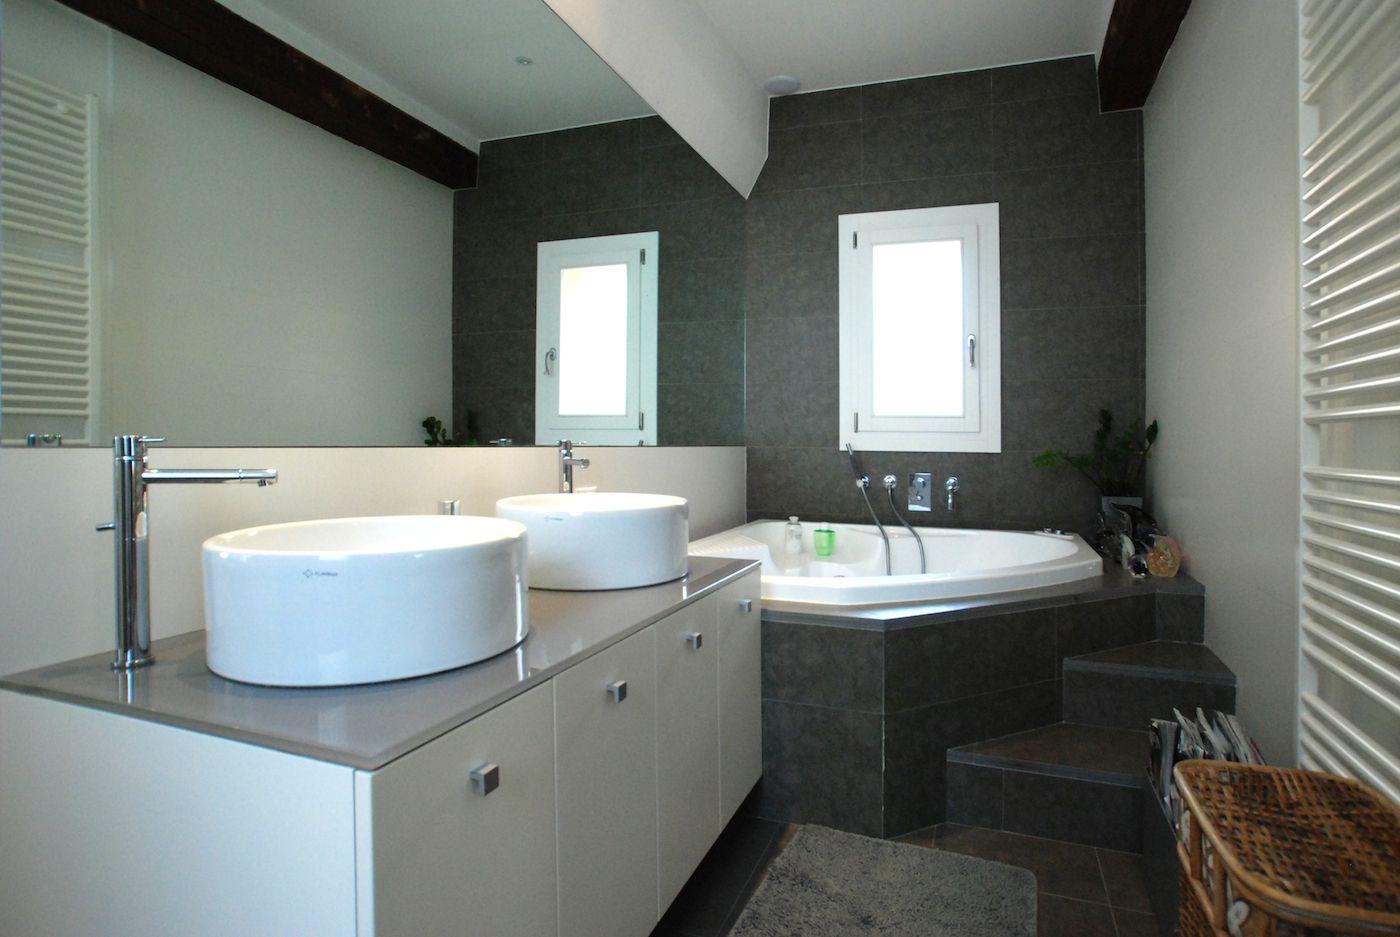 an exclusive en-suite bathroom with whirlpool